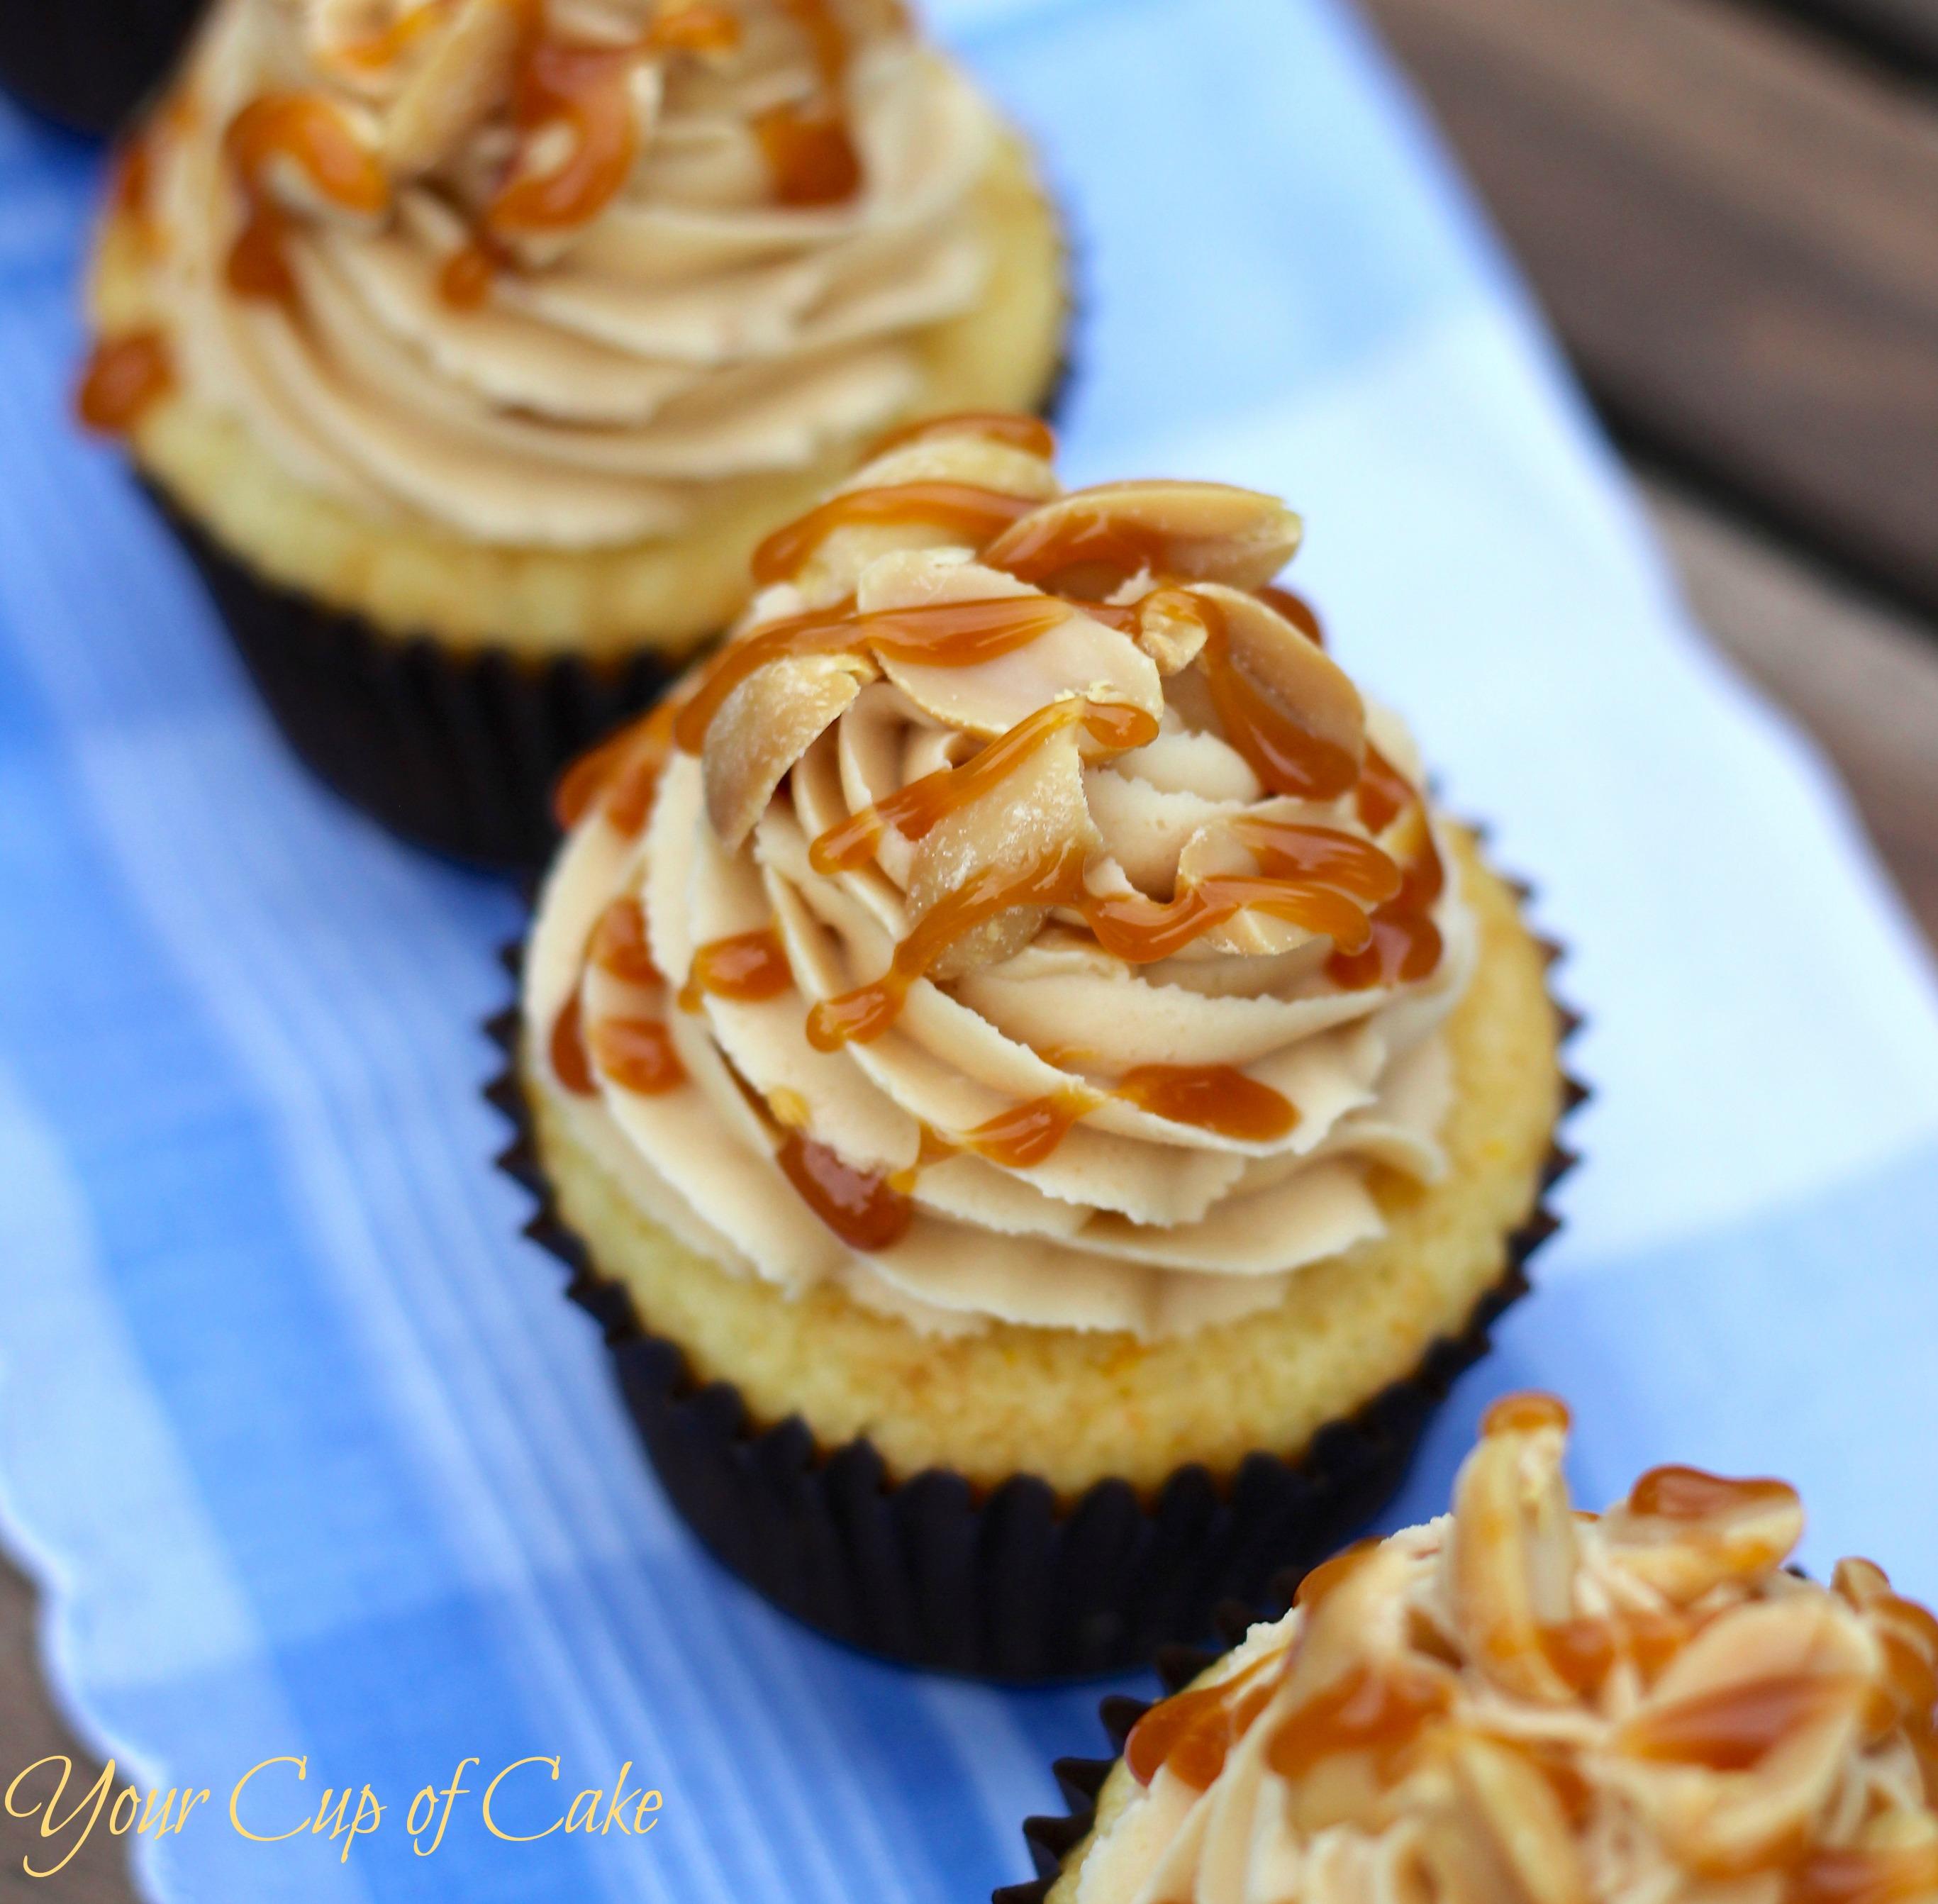 peanut butter cupcakes recipe cake mix